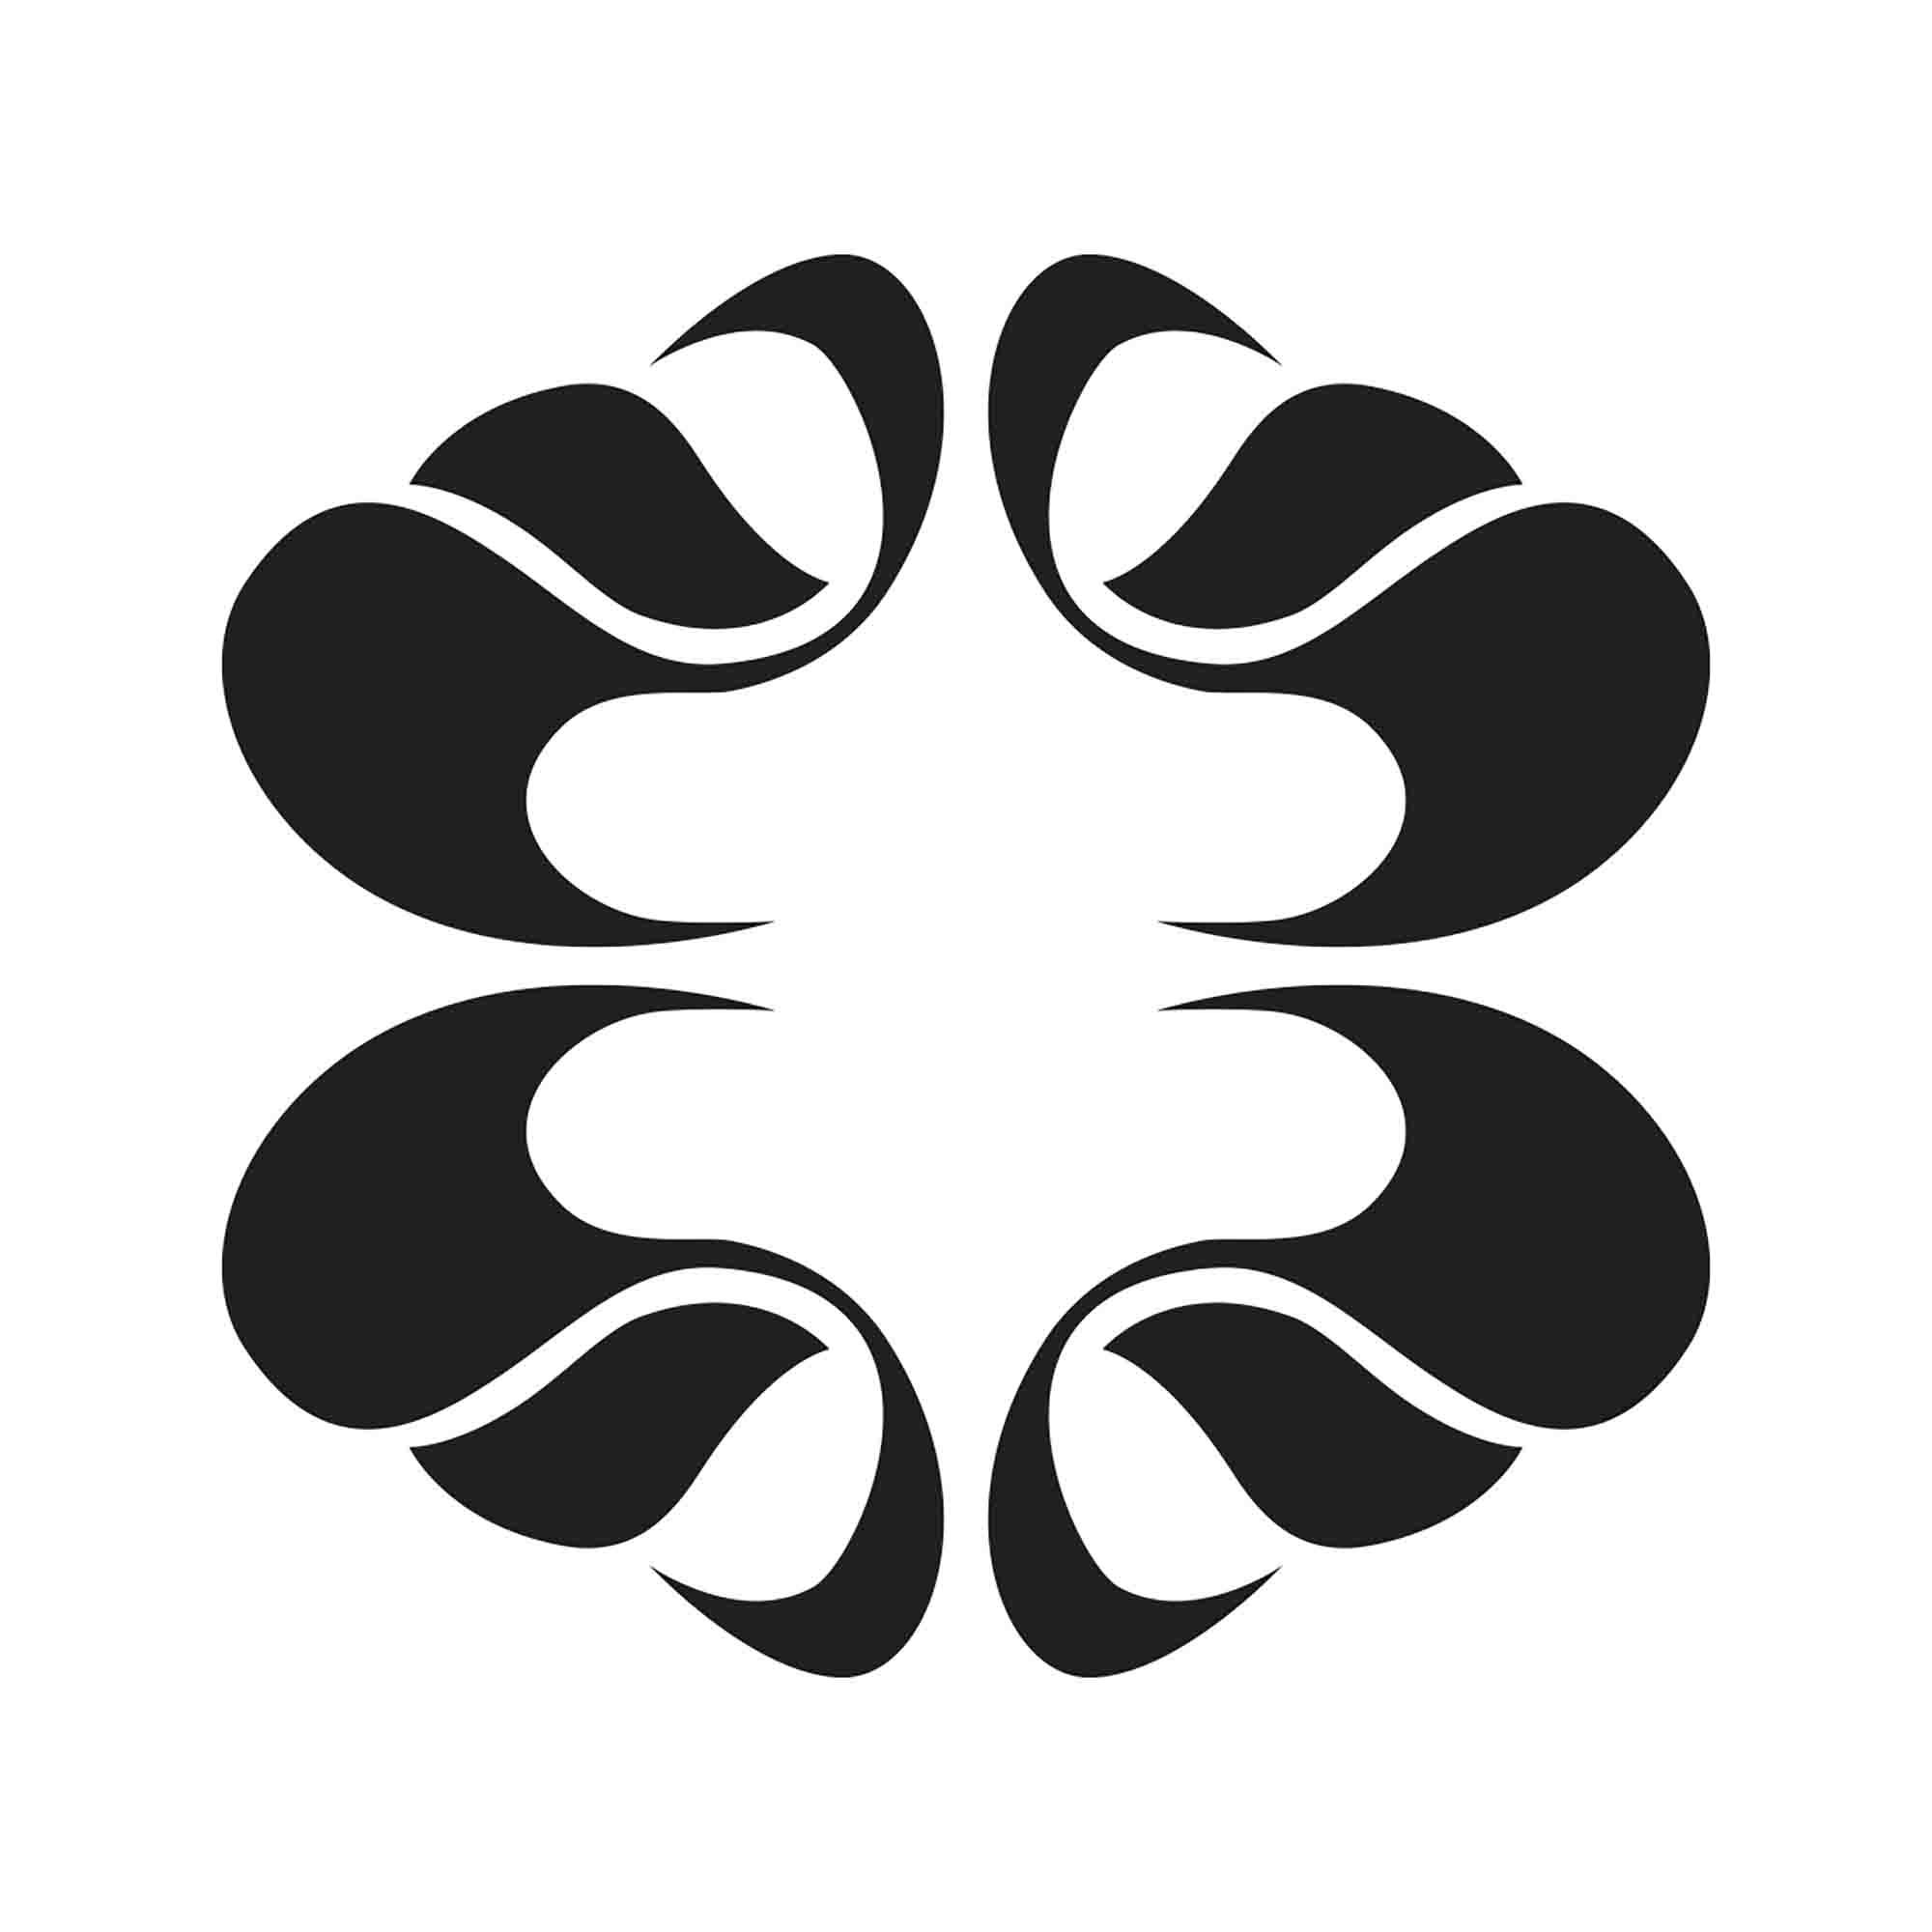 Sycee - logo